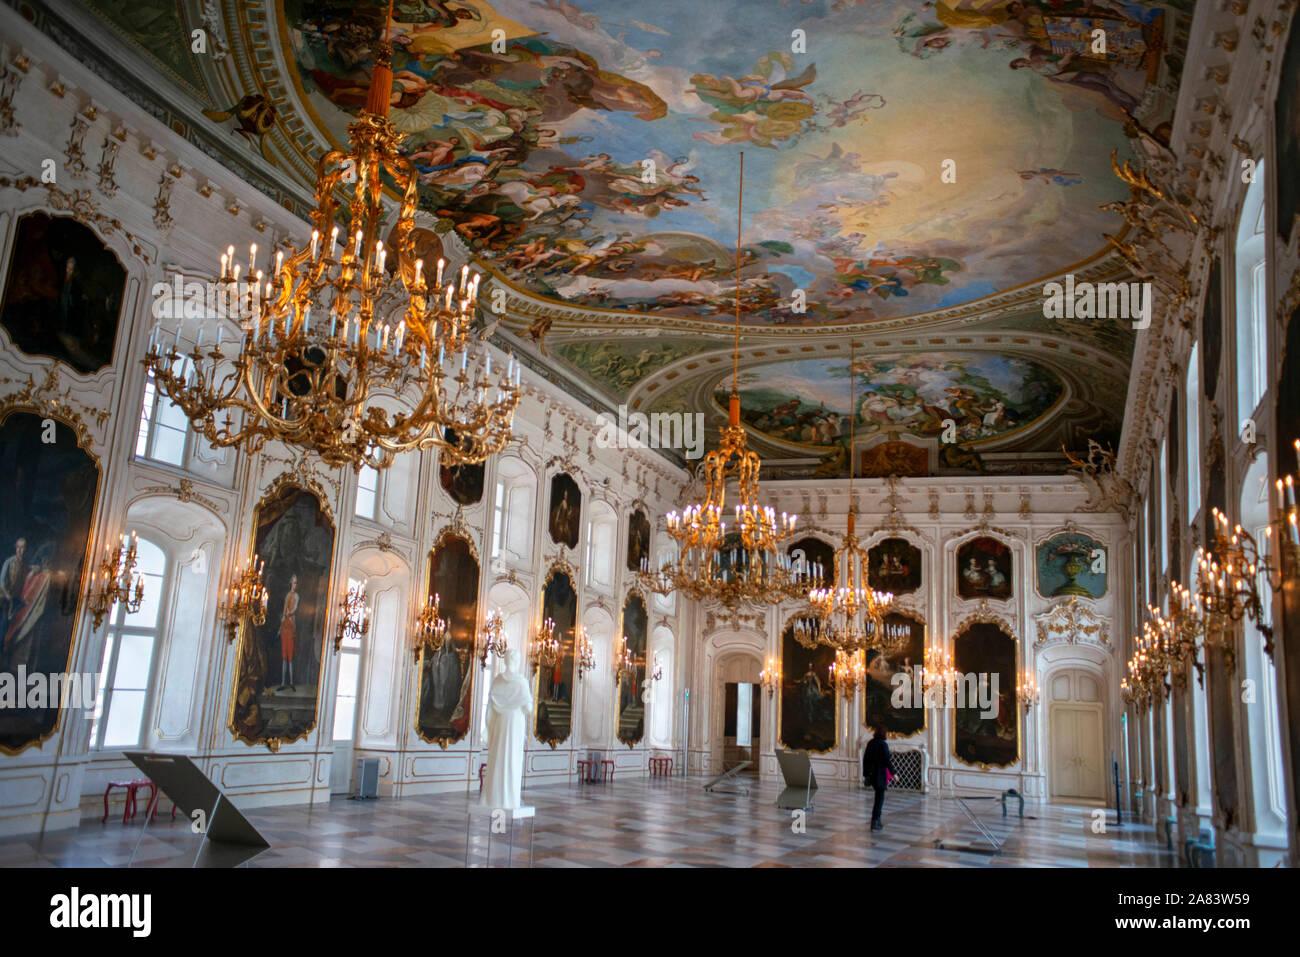 Inside Kaiserliche Hofburg Imperial Palace, seen from Rennweg, Innsbruck, Inn Valley, Tyrol, Austria Stock Photo